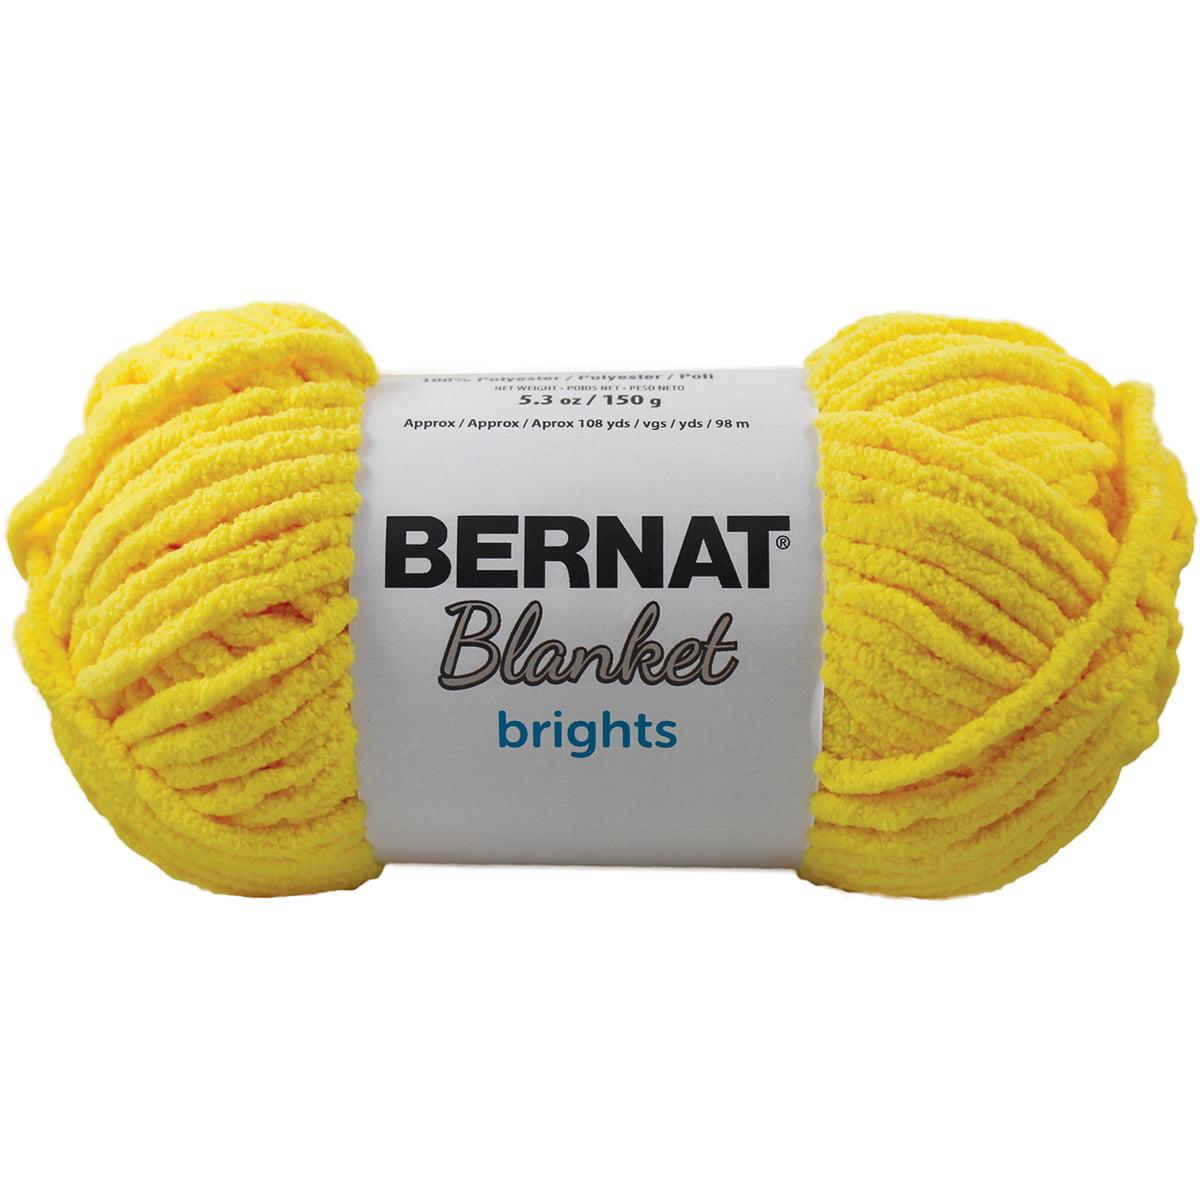 Bernat Blanket Brights Big Ball Yarn Royal Blue